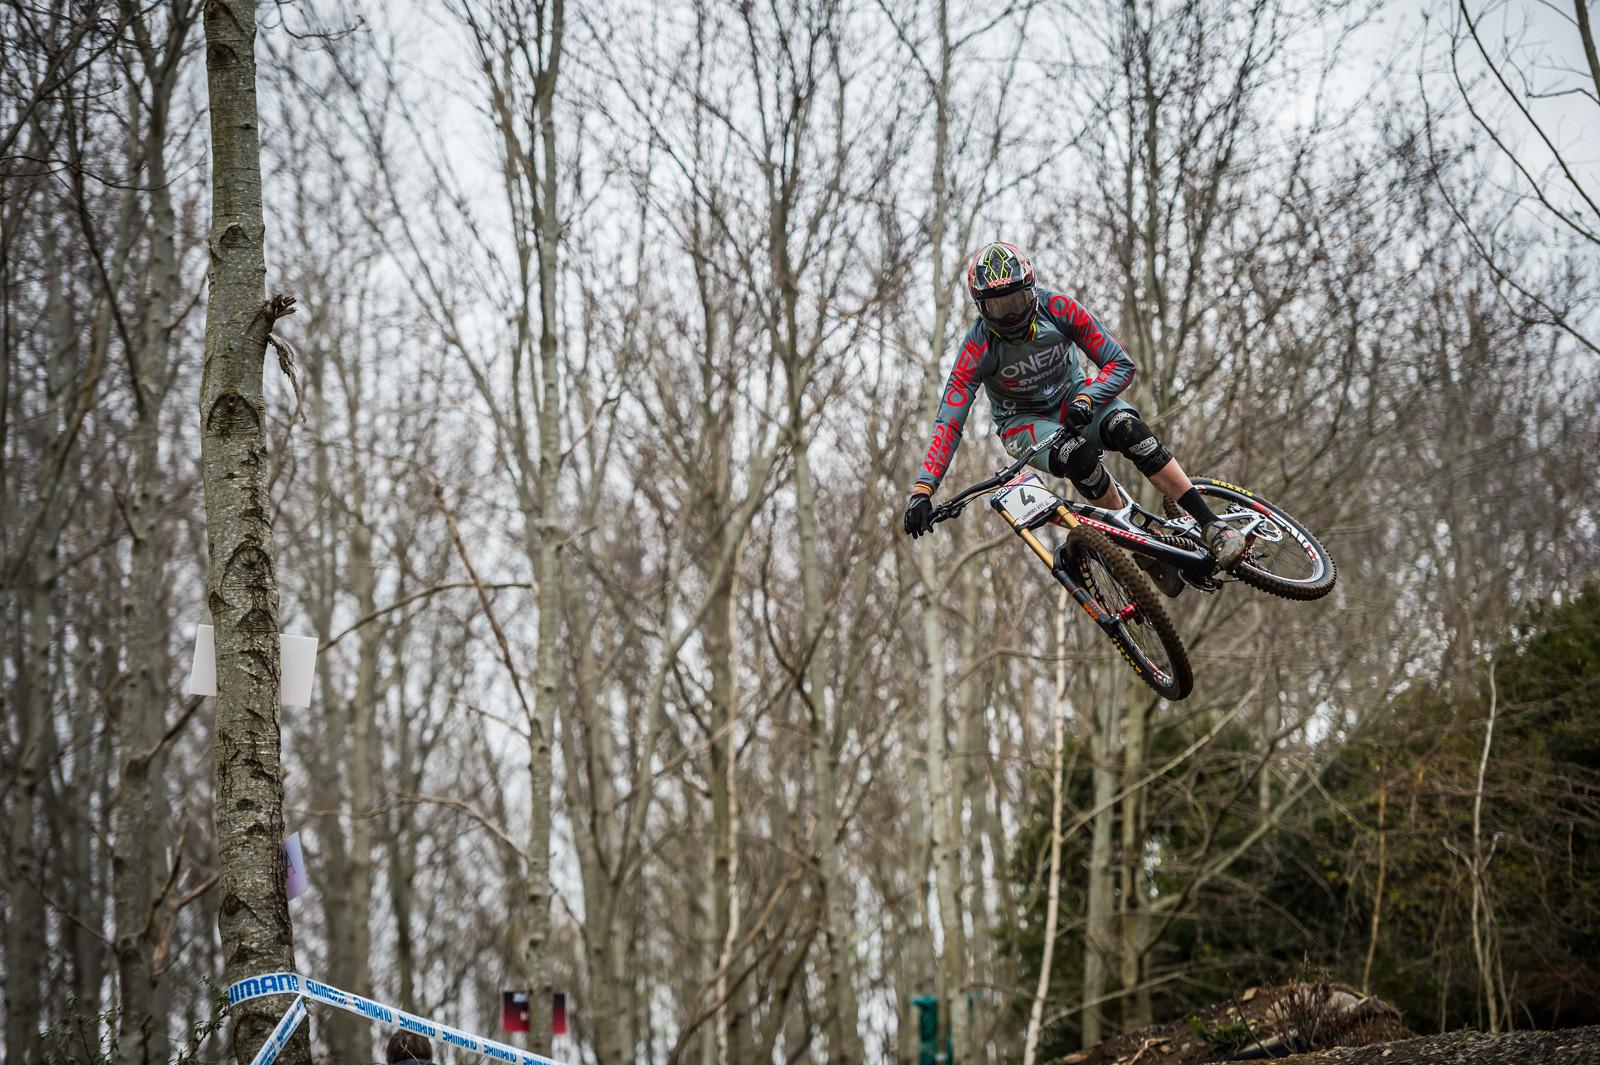 Minnaar - Check the Knees! - iceman2058 - Mountain Biking Pictures - Vital MTB